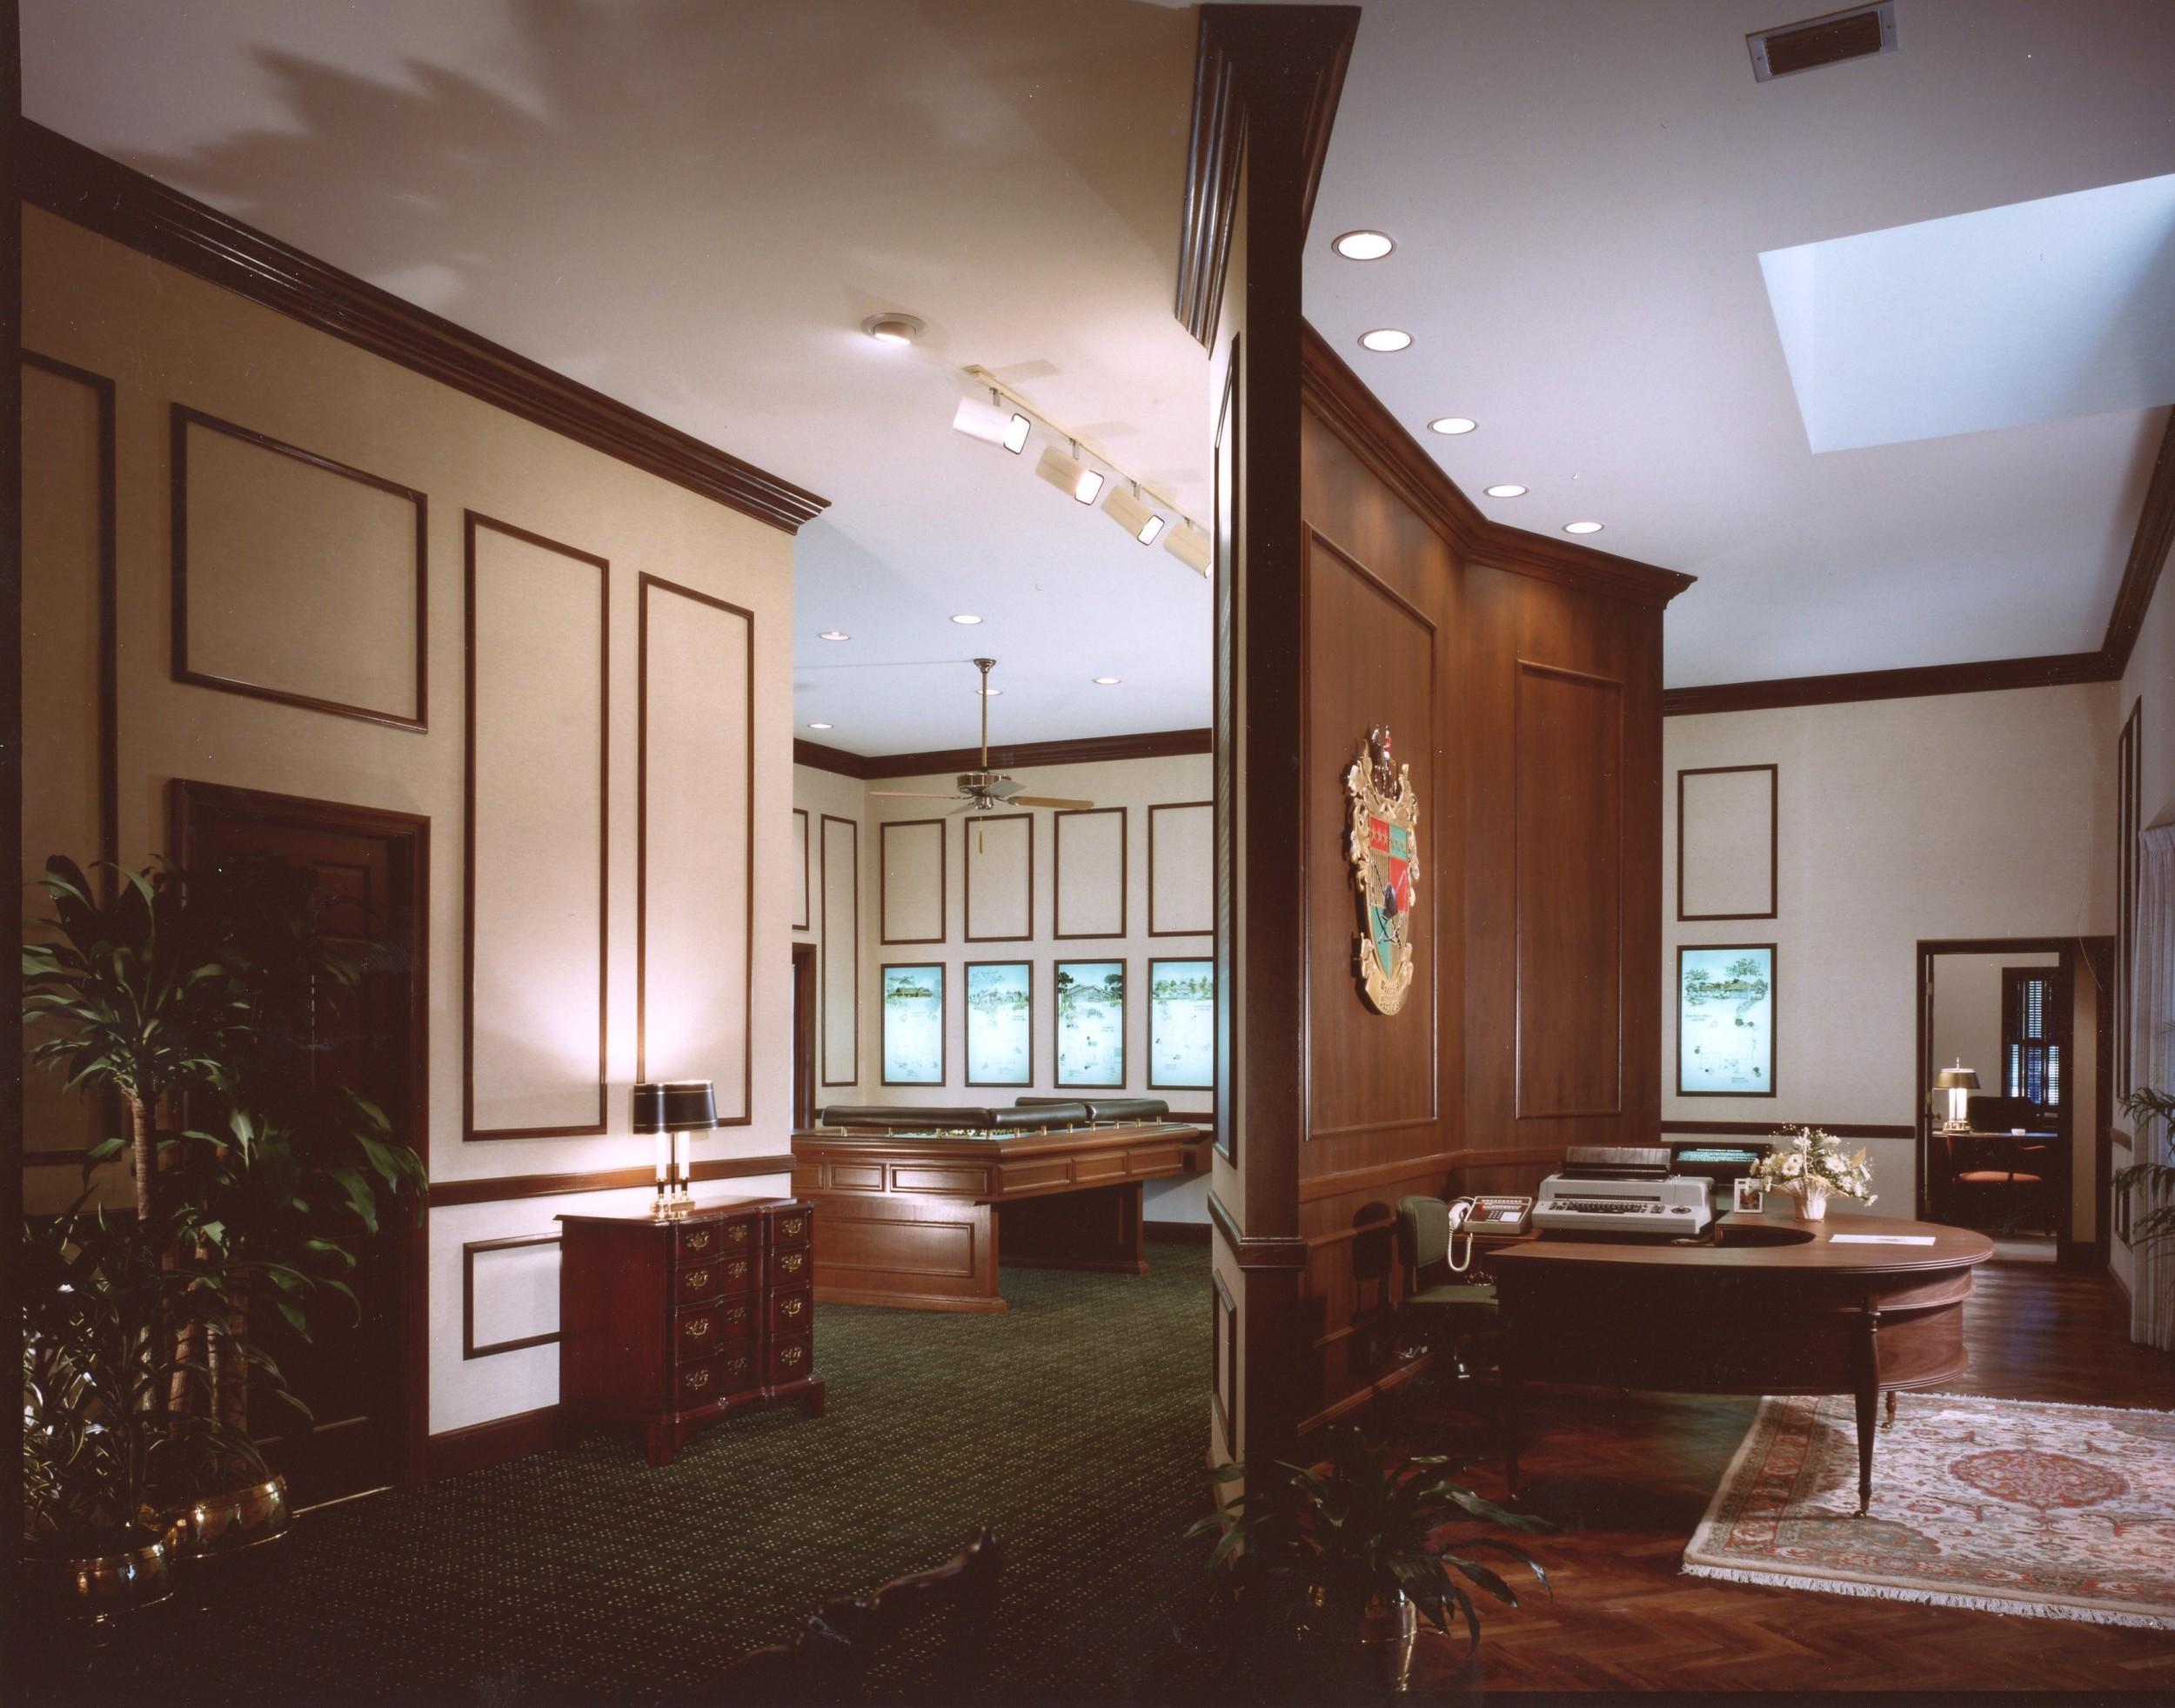 Entry Reception & Display